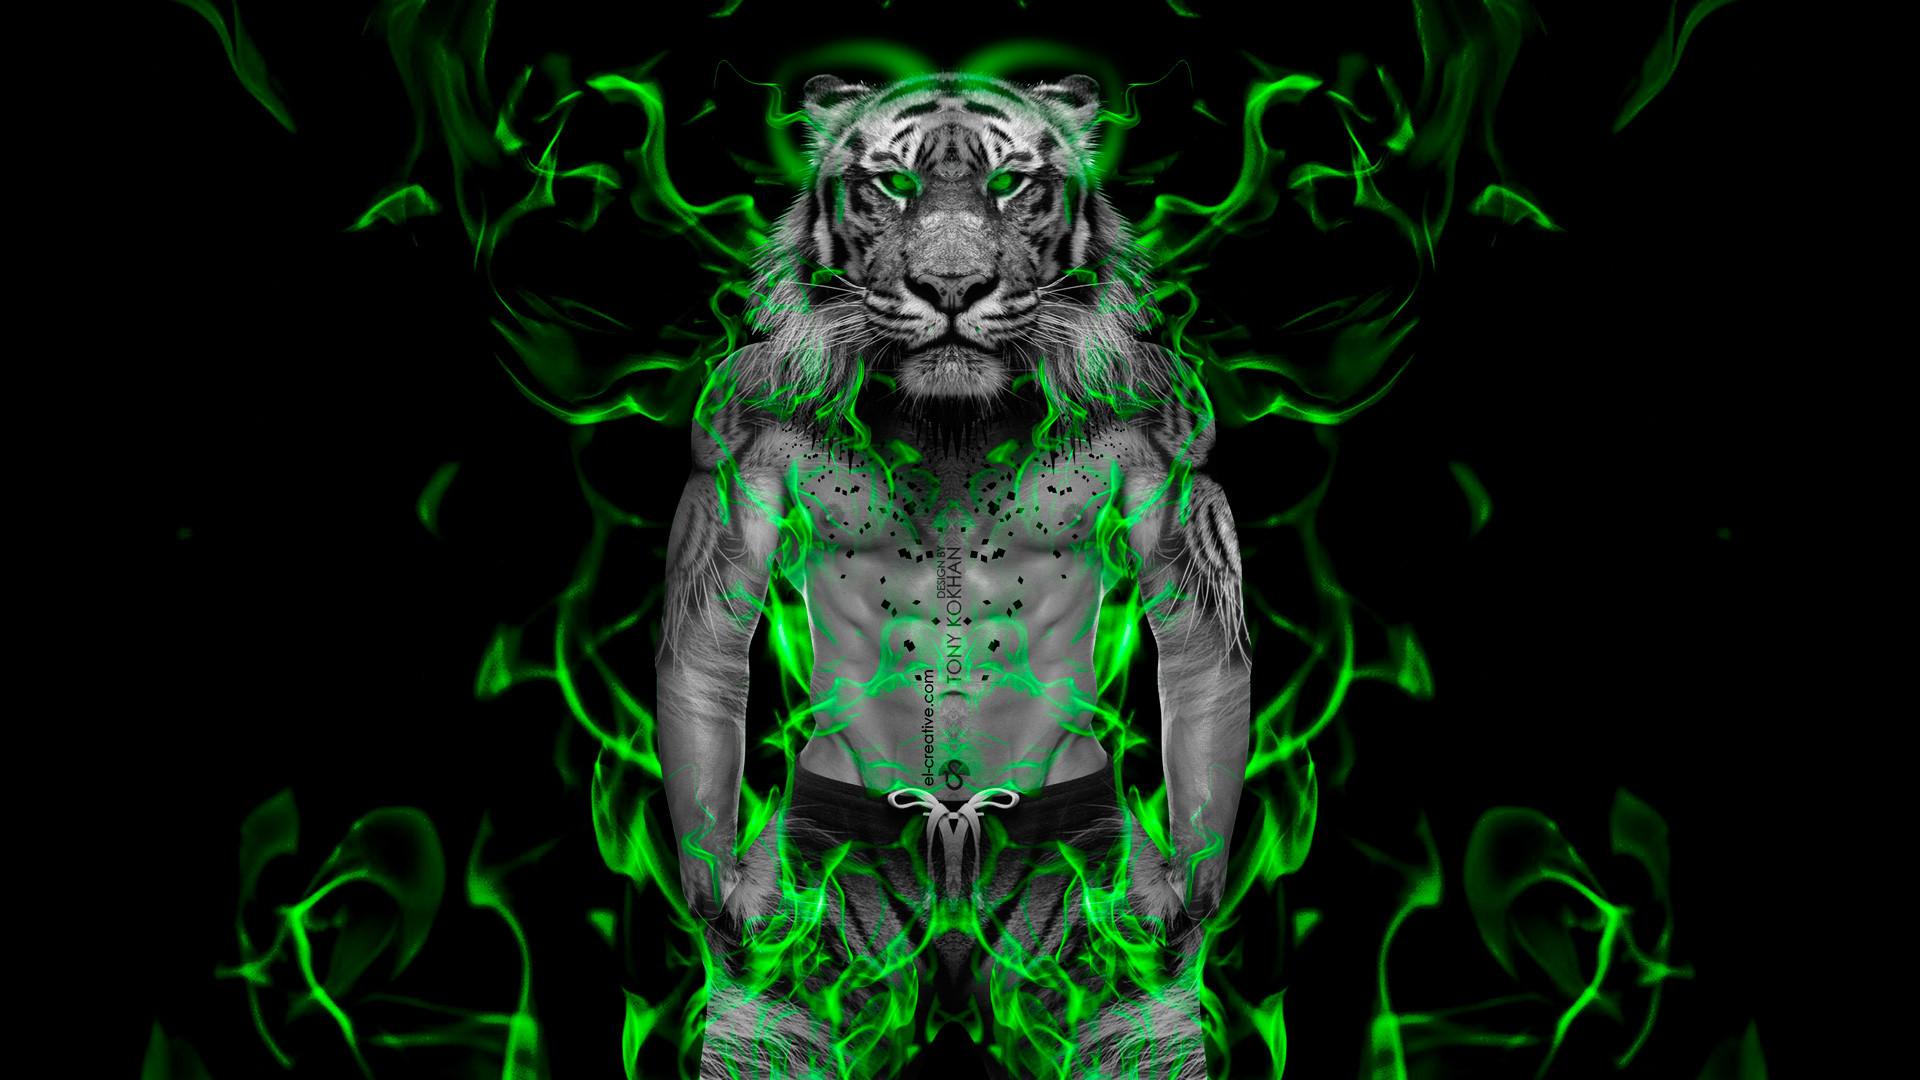 … Fantasy-Muscle-Fire-Boy-Tiger-2014-Green-Neon- …